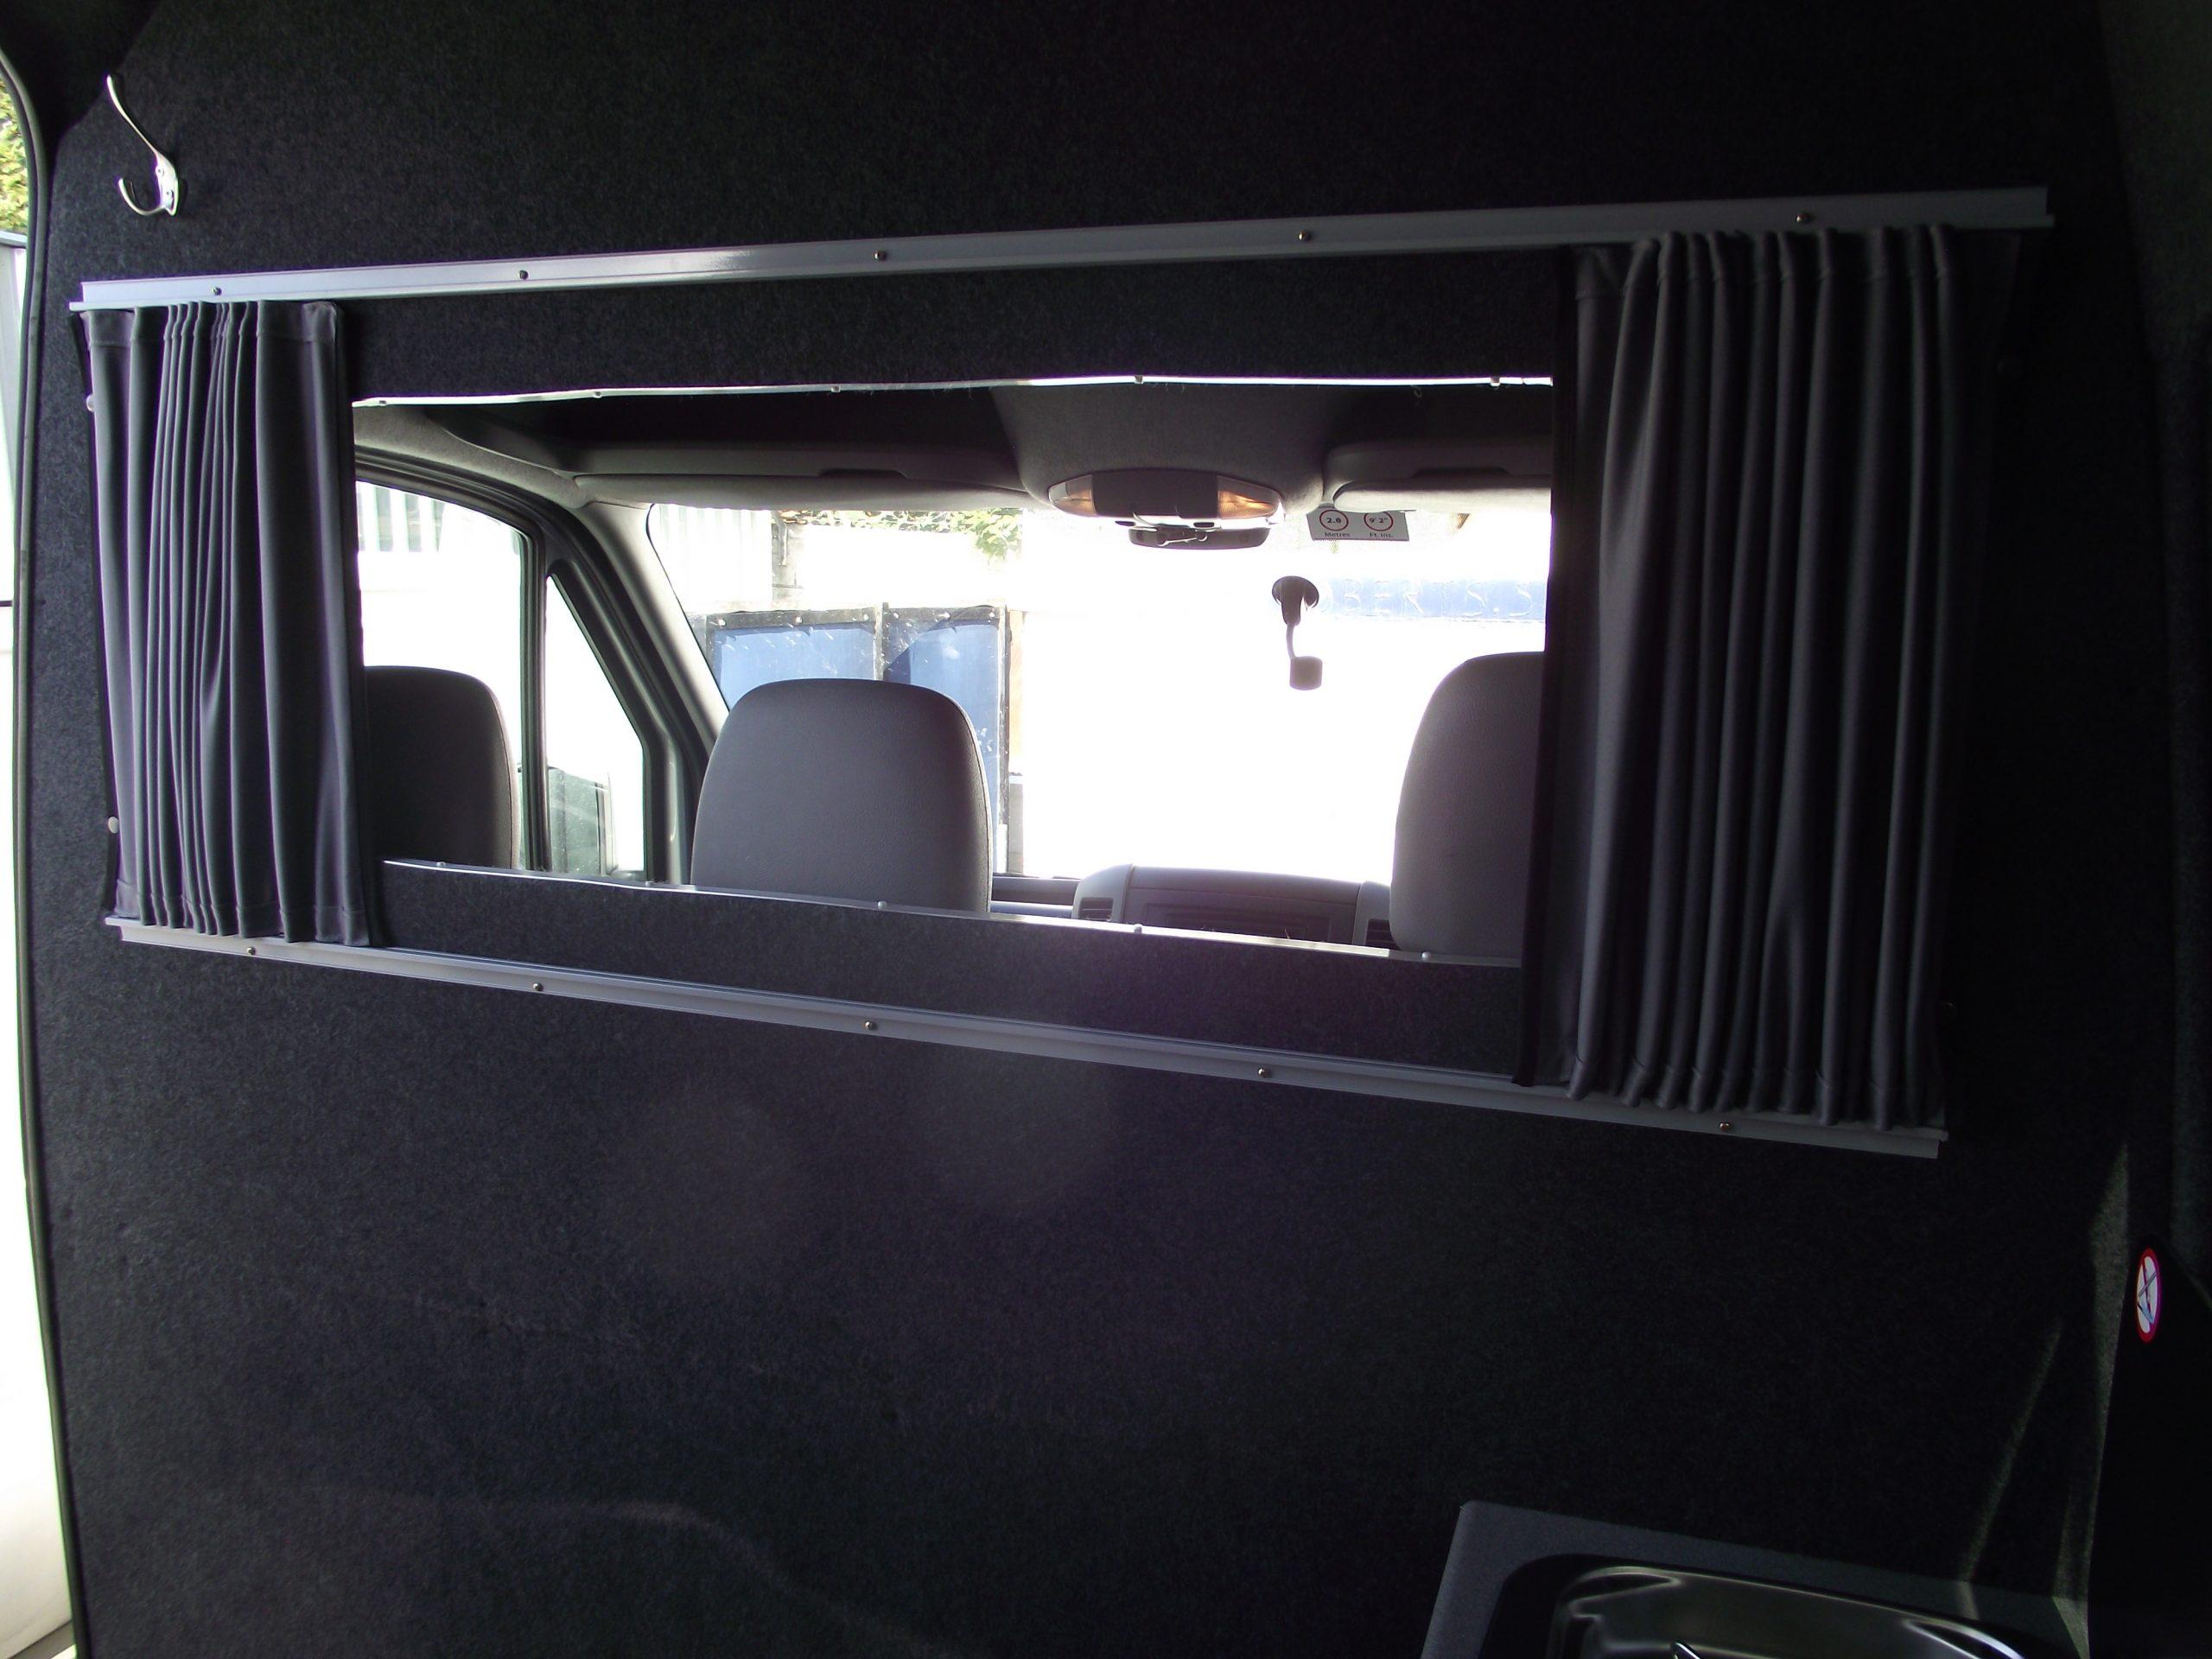 VW crafter bulkhead window